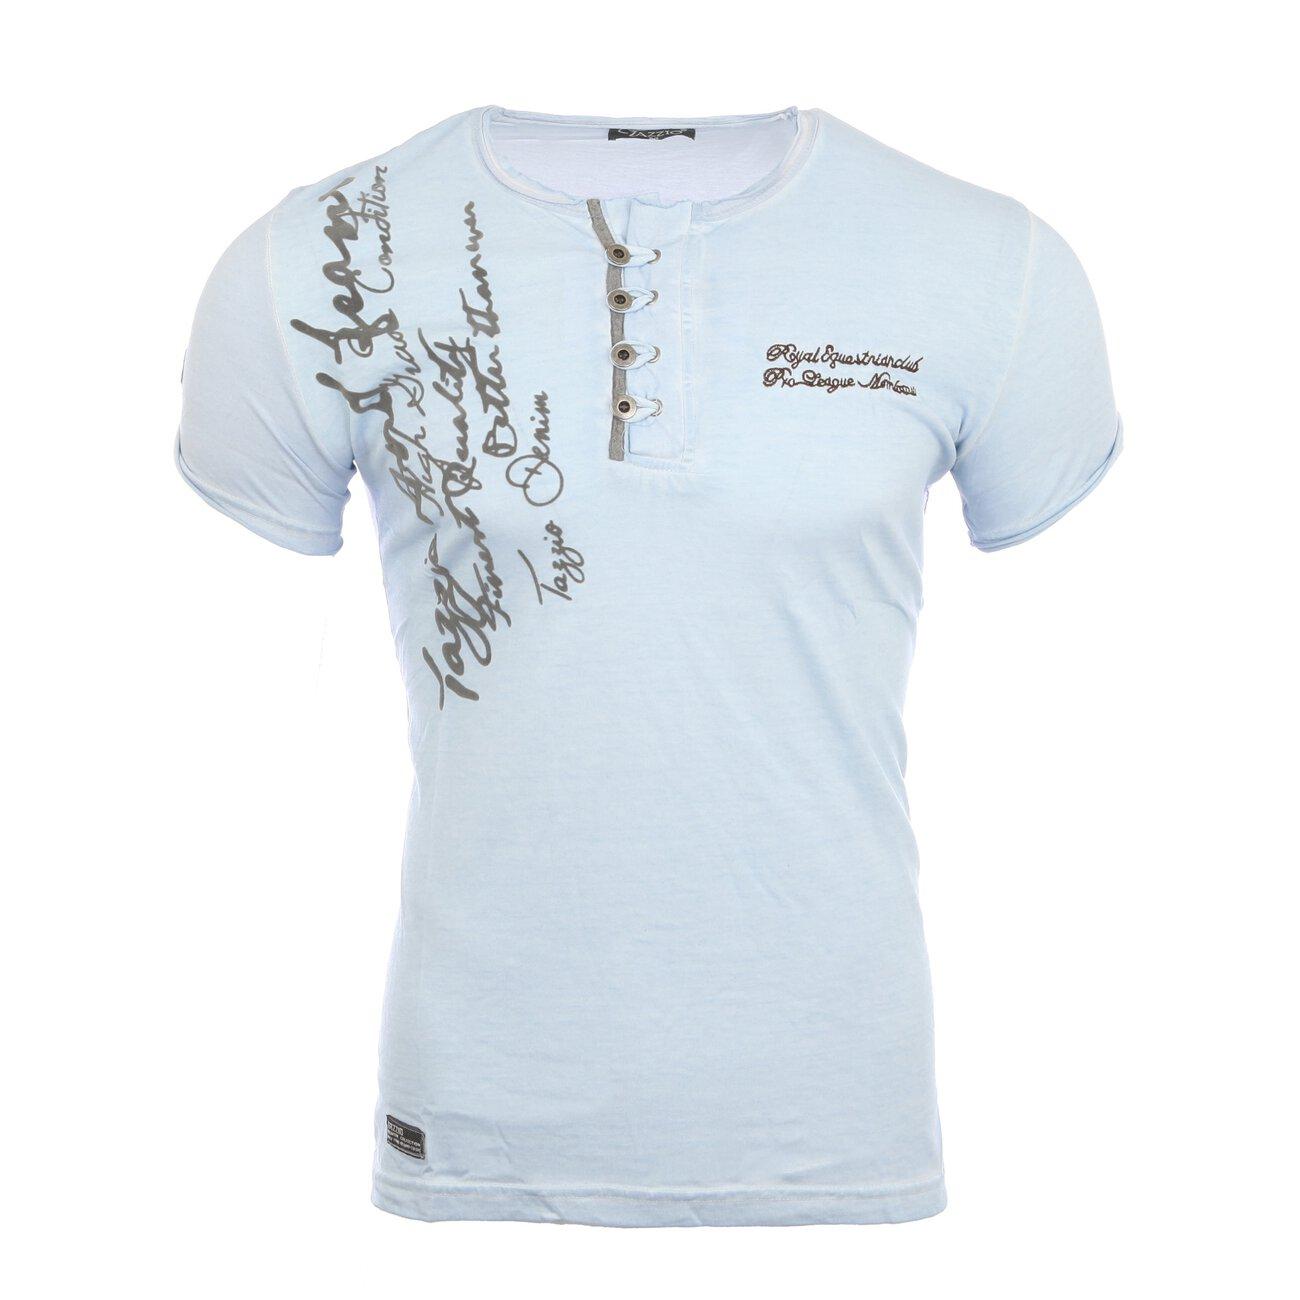 ca4c7fee7a6bee Batik T-Shirt Herren Reslad 4050